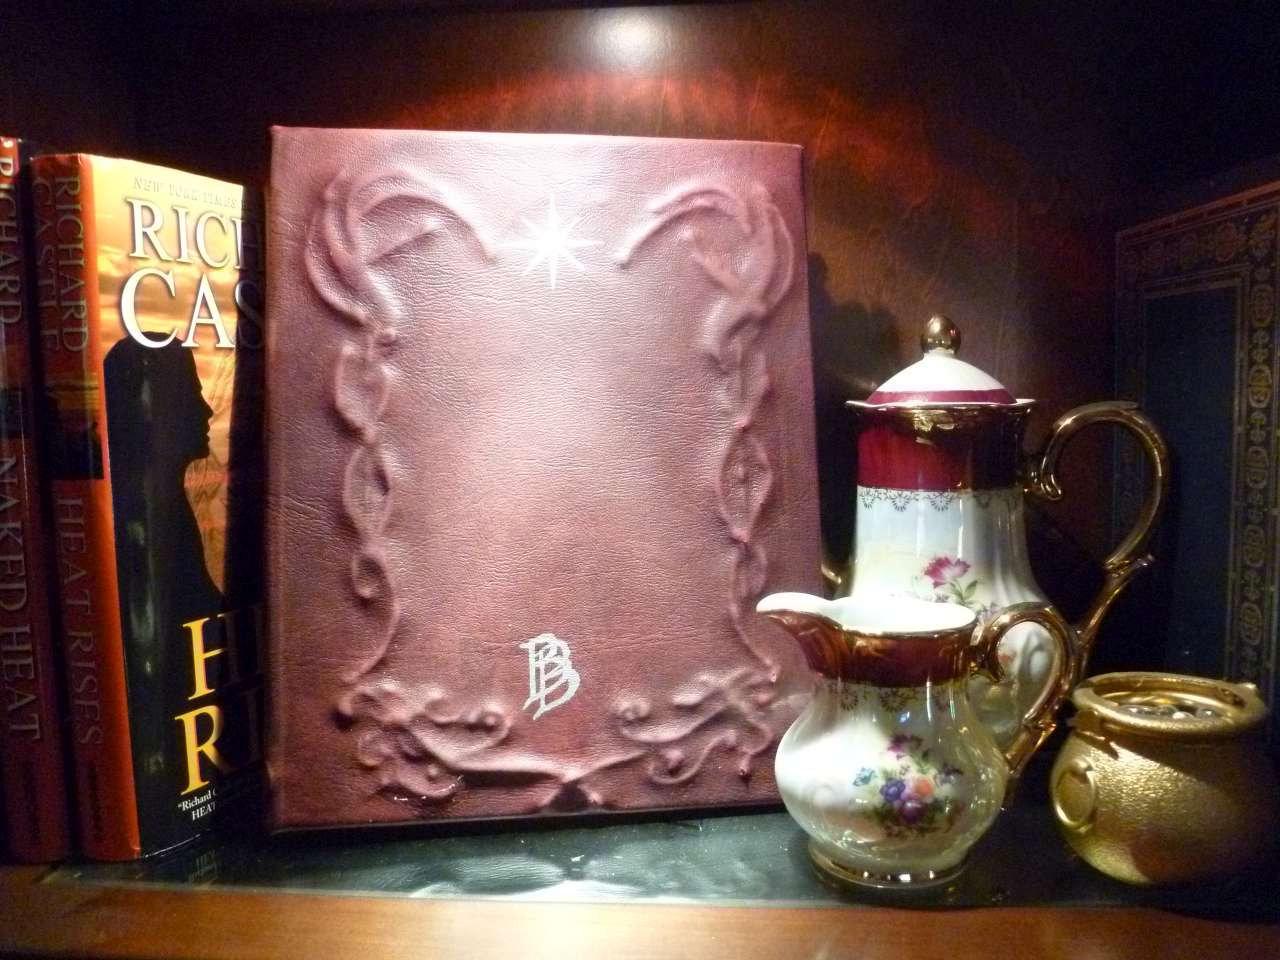 Full book hobbit the